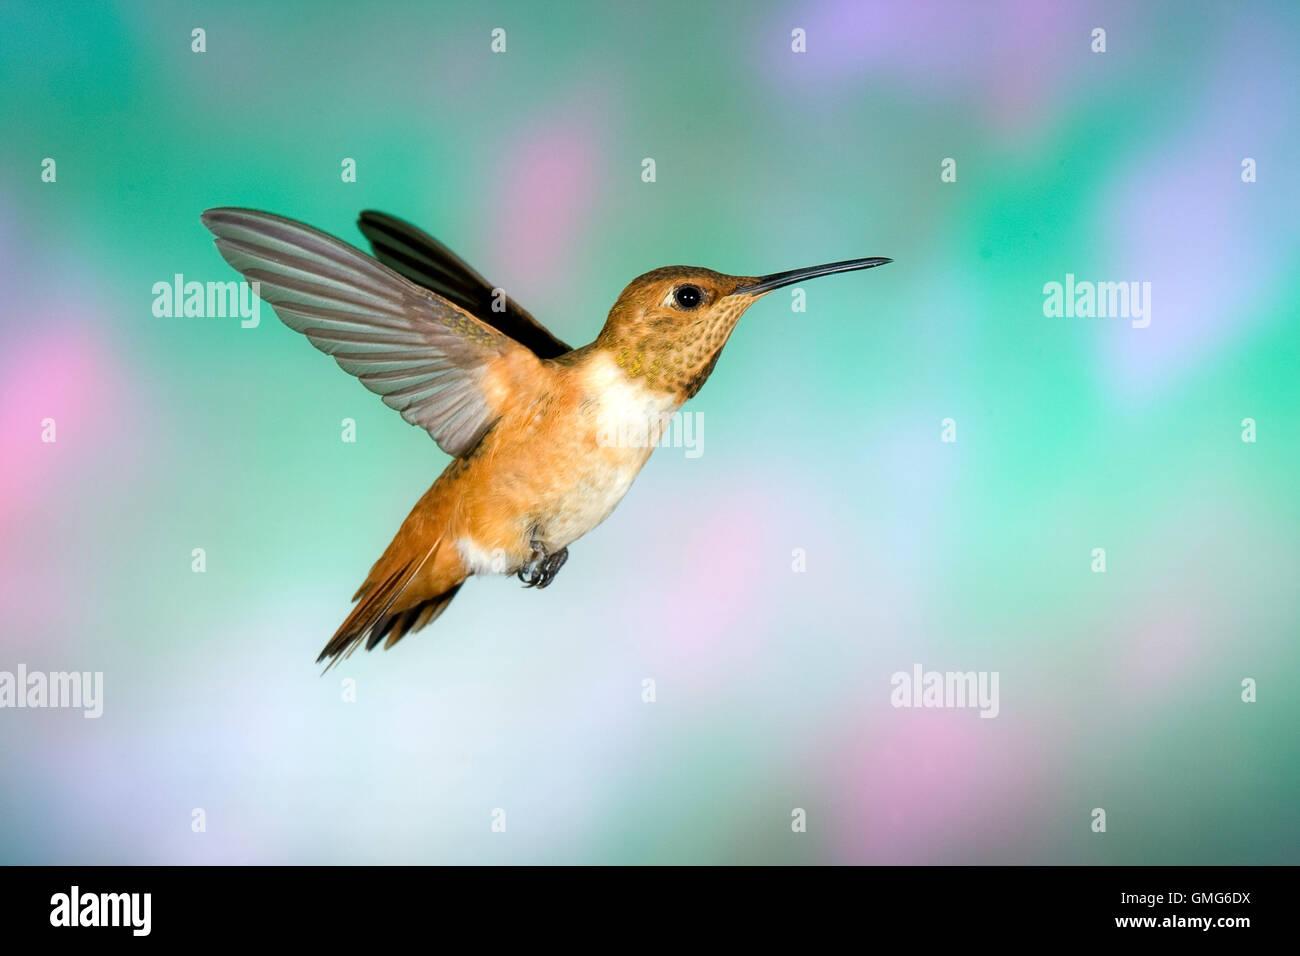 Allen's Hummingbird  Selasphorus sasin Sierra Vista, Cochise County, Arizona, United States 23 August       - Stock Image